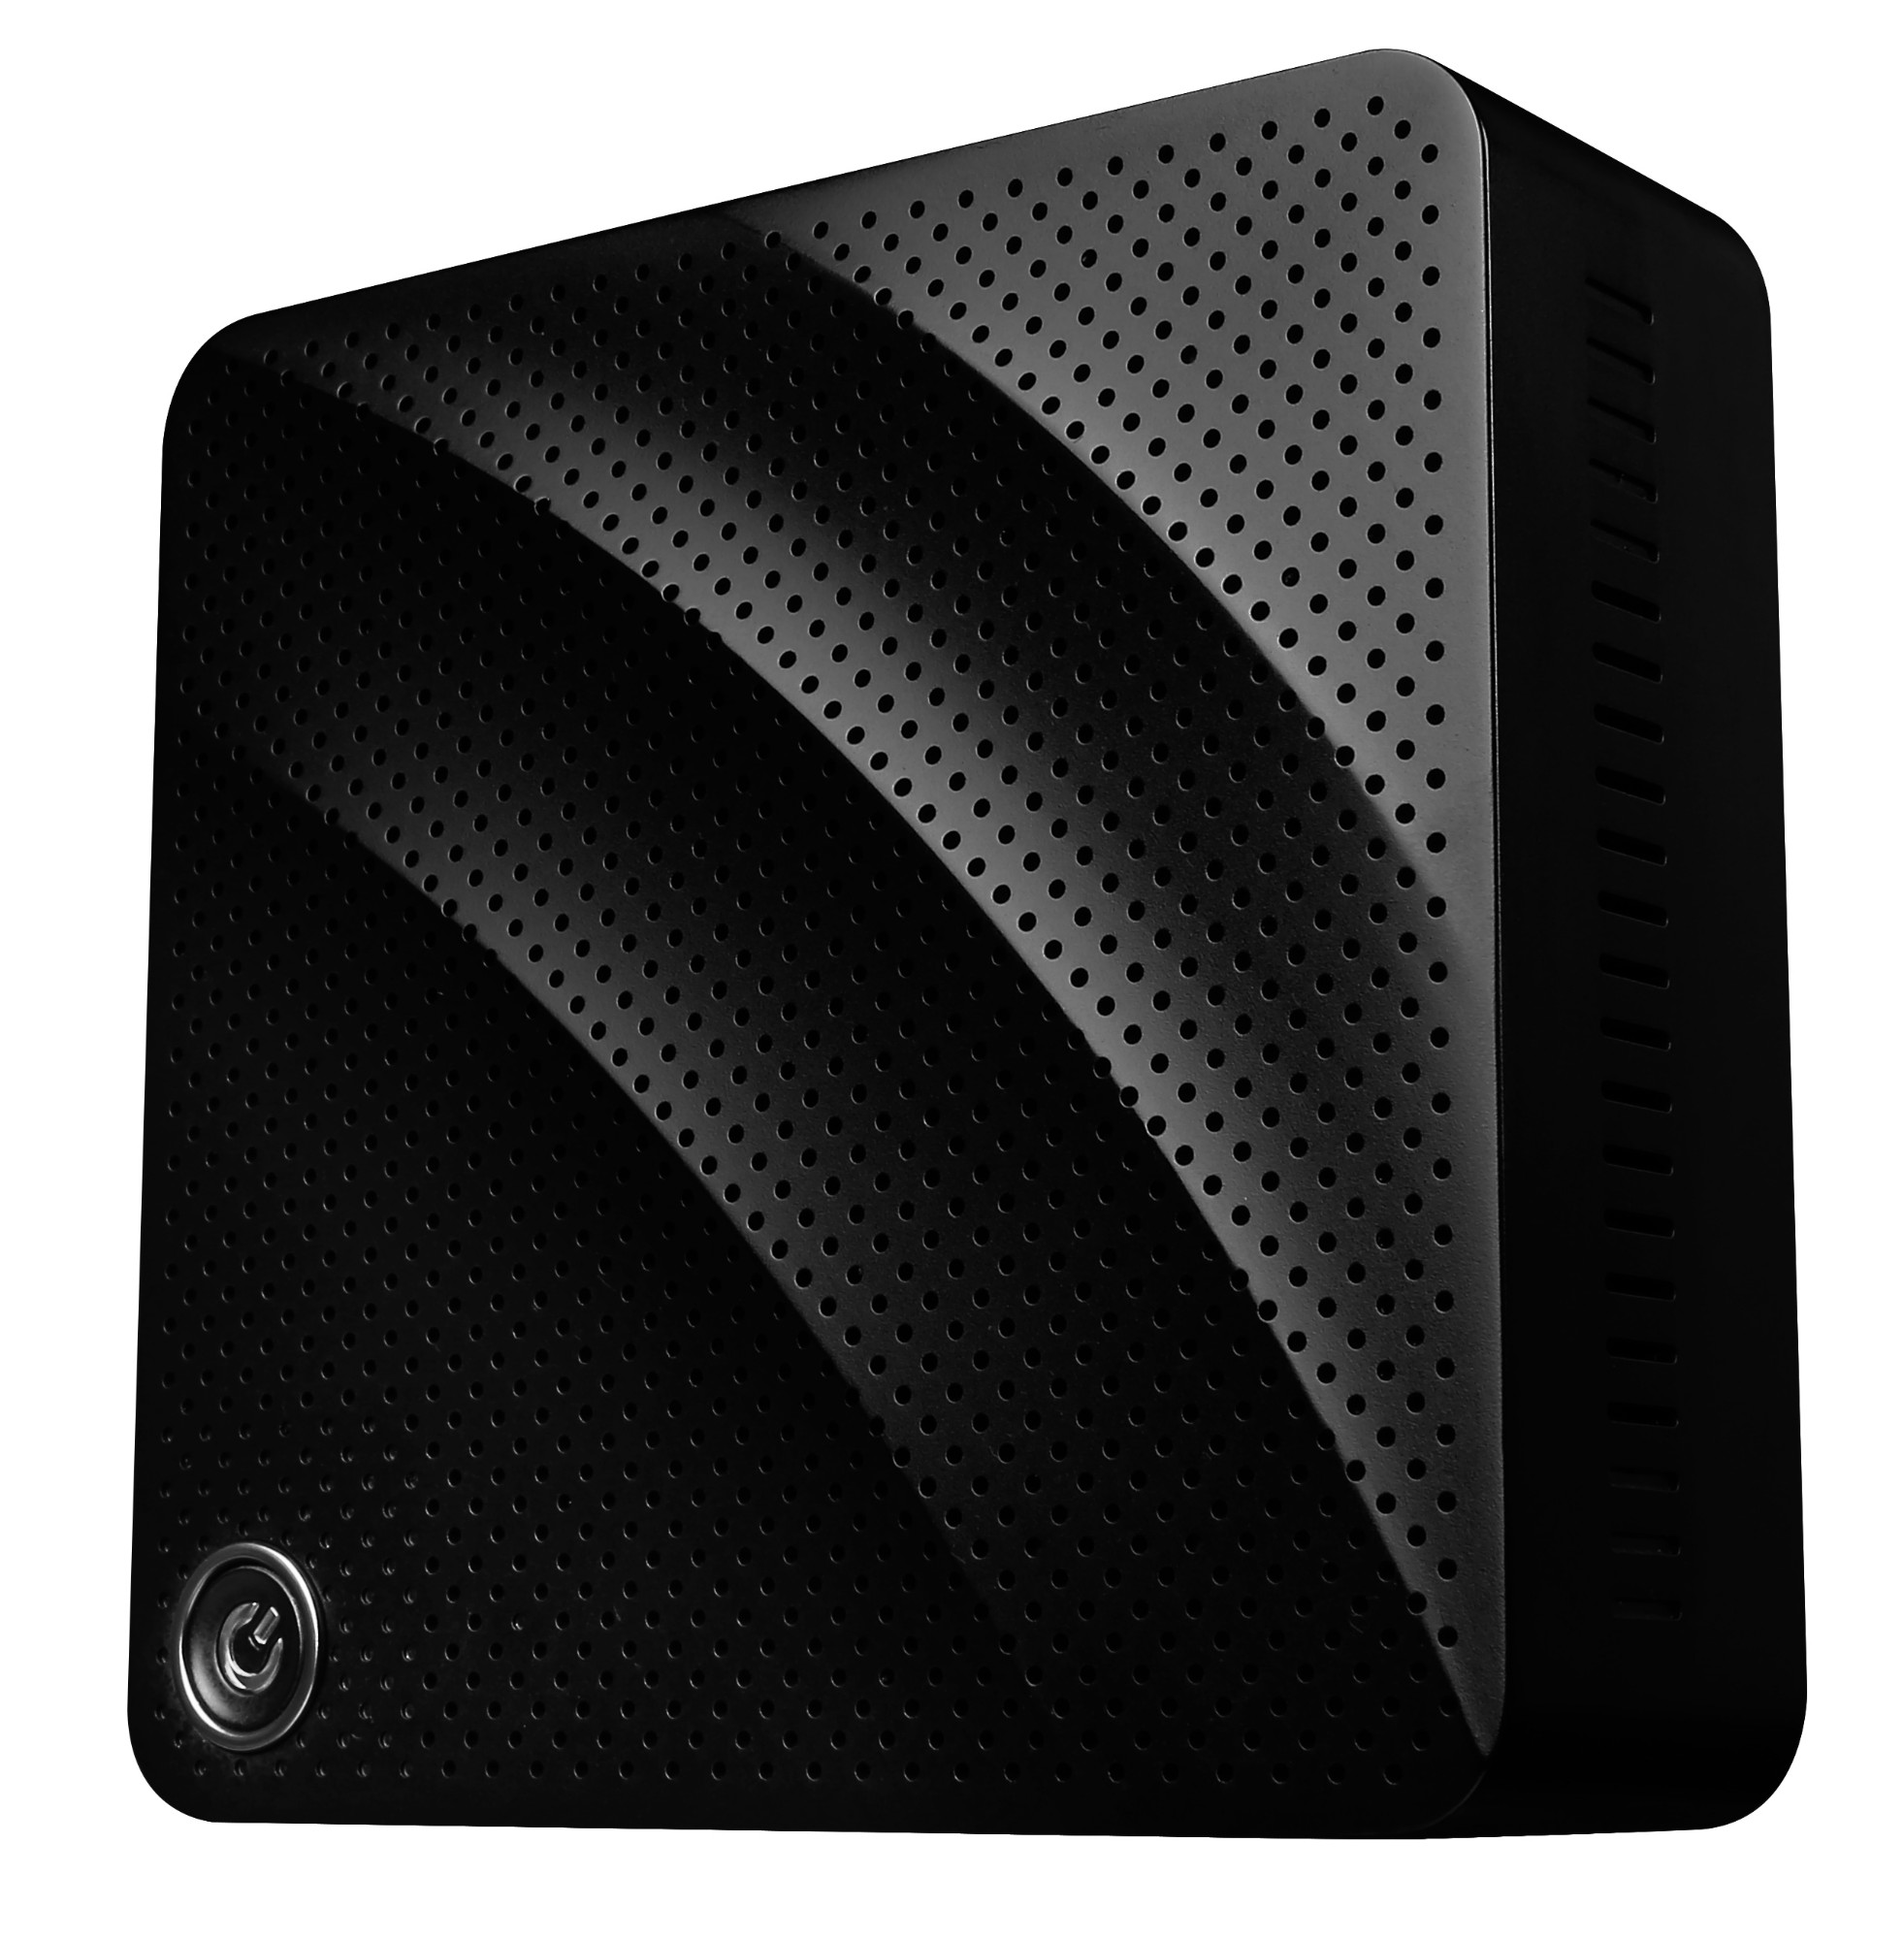 MSI CUBI N-020BEU Intel Soc BGA1170 1.6GHz N3710 0.6L sized PC Black